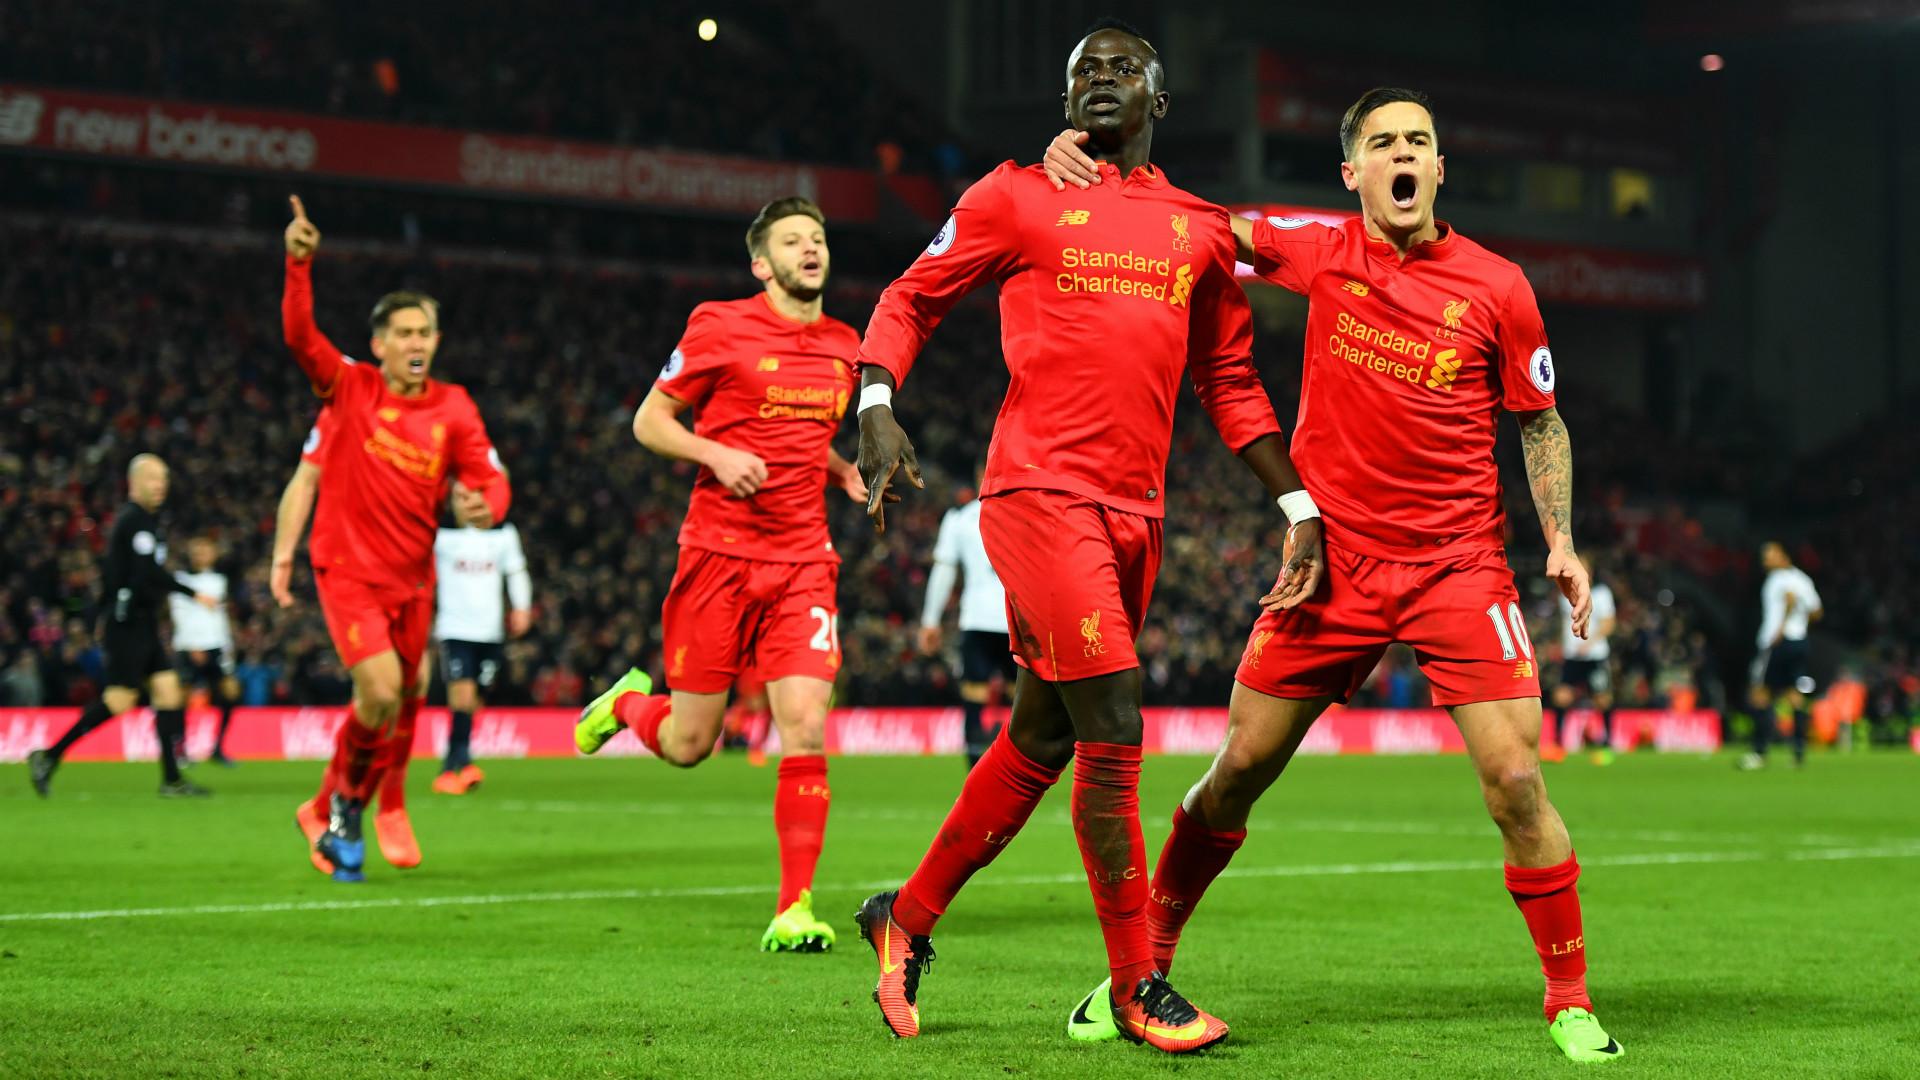 Wallpaper : Liverpool FC, Sadio Mane, Philippe Coutinho